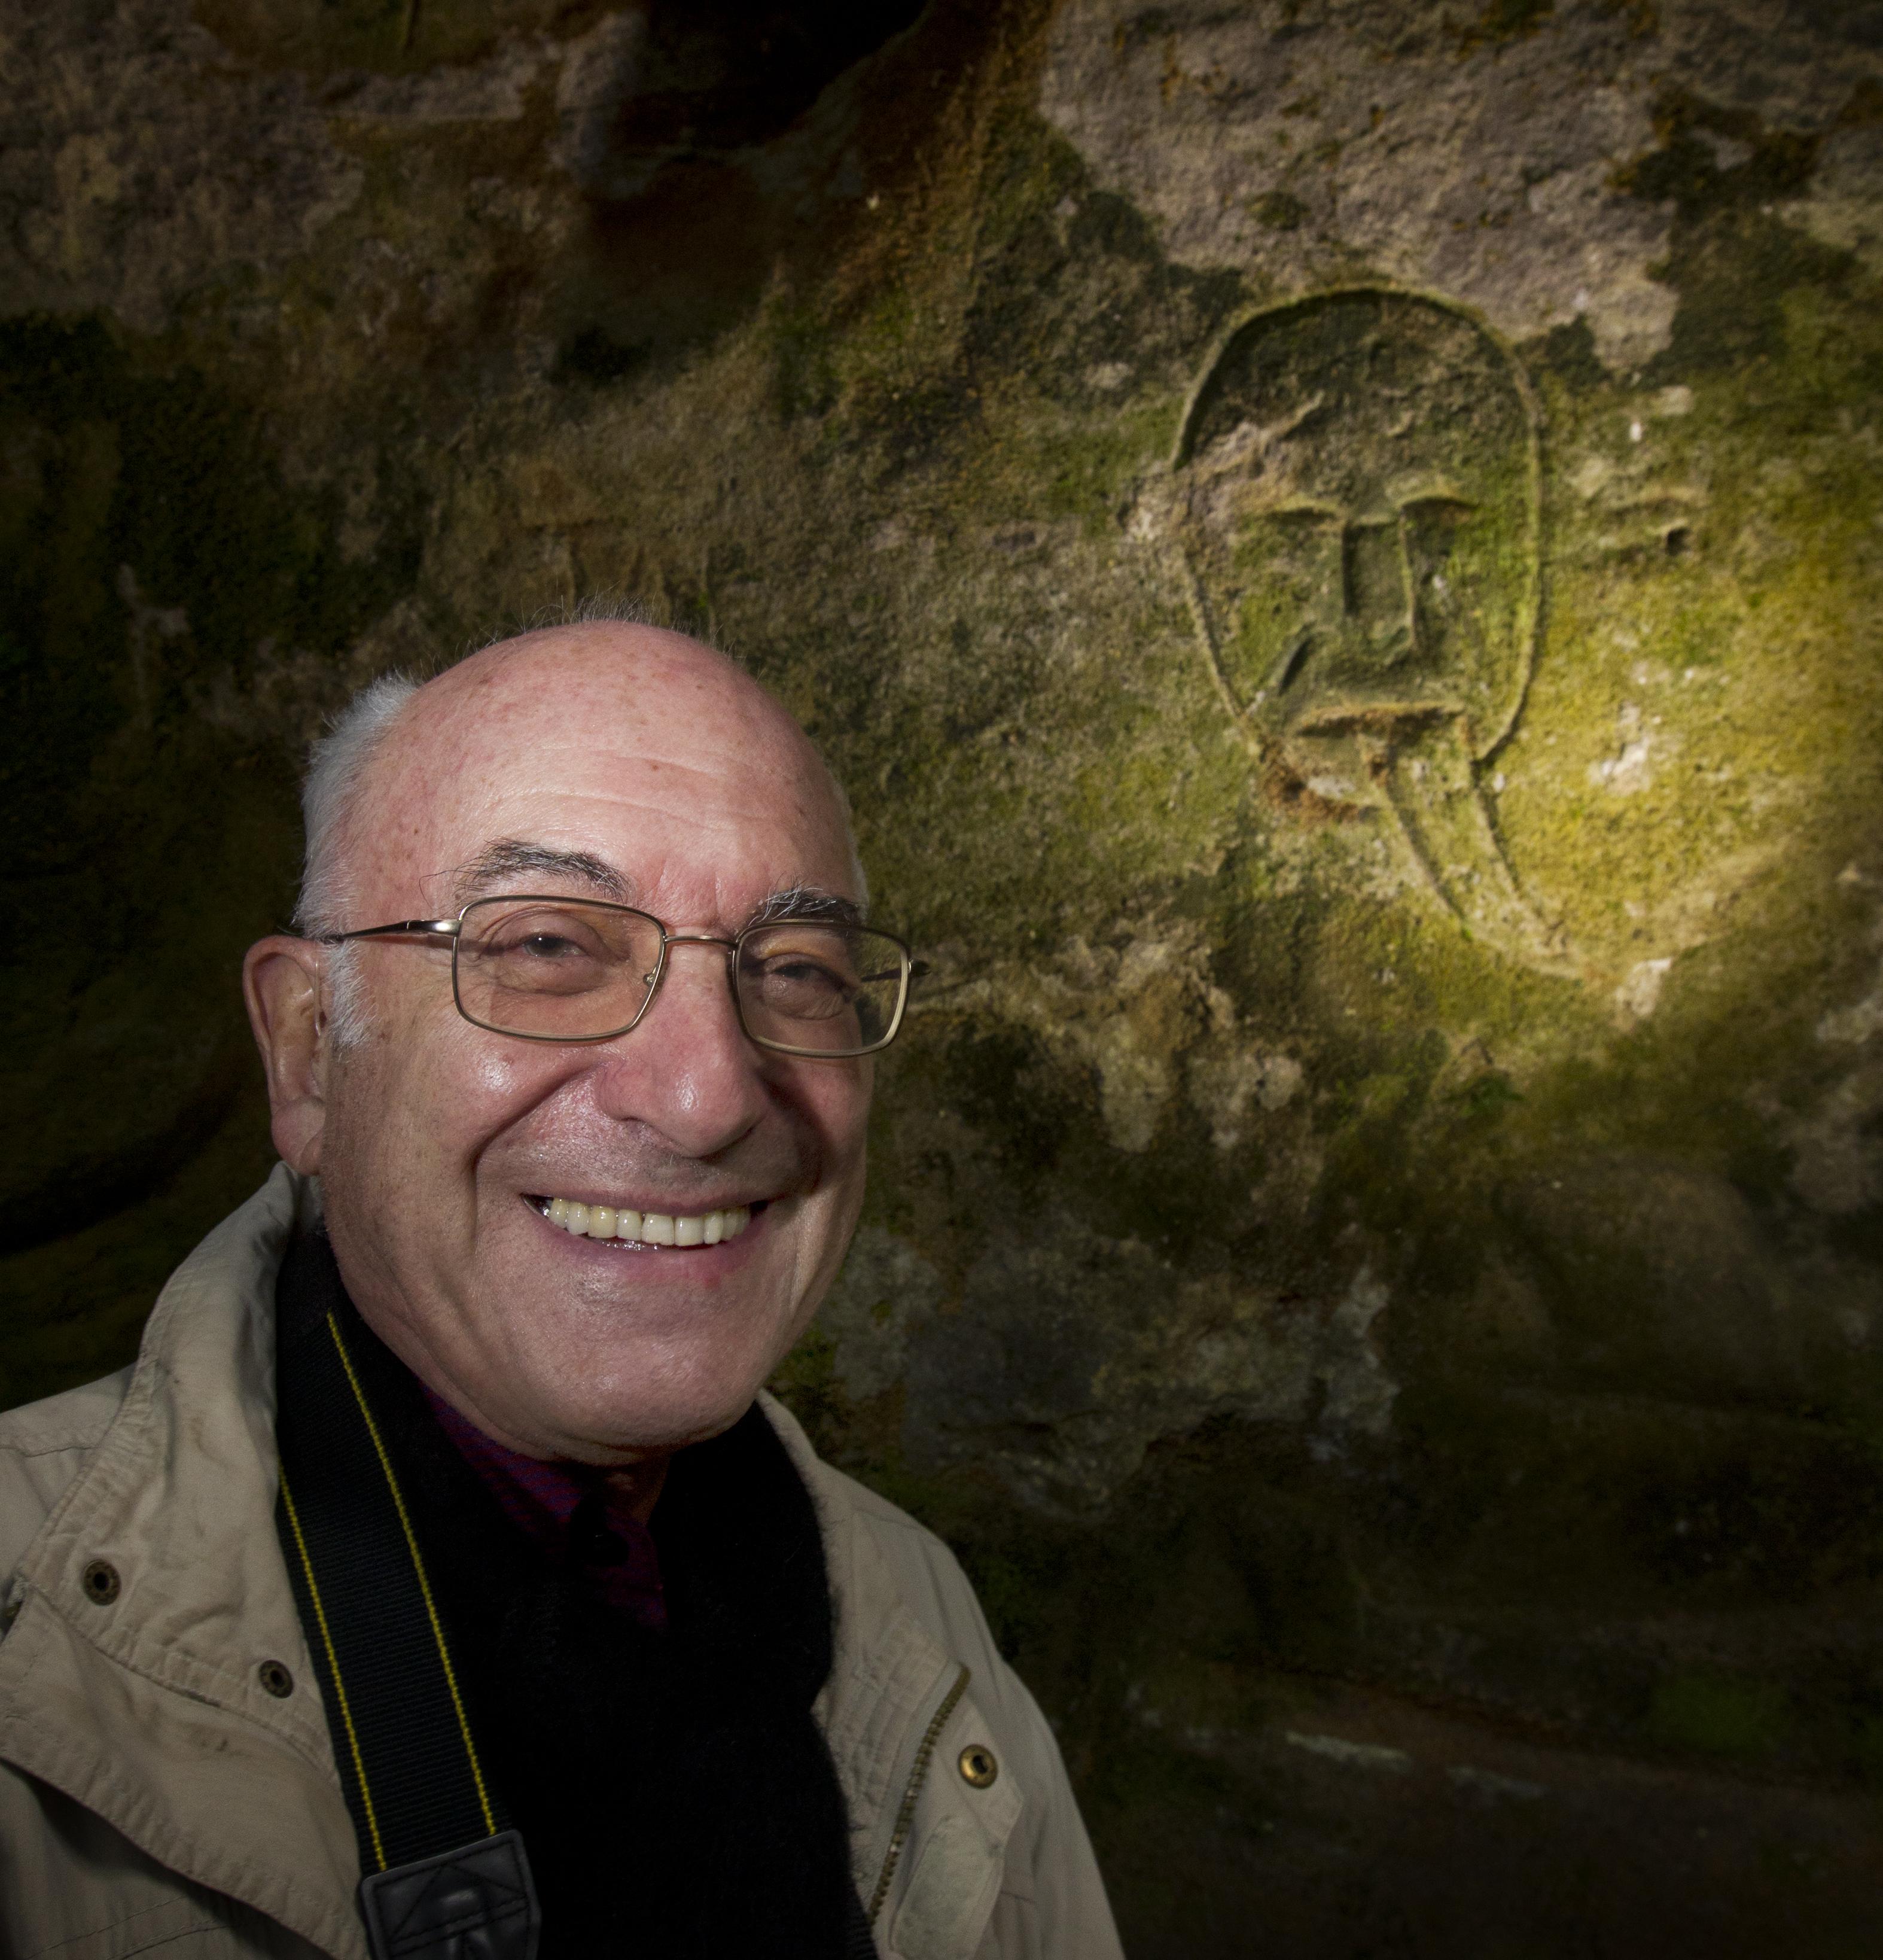 Rock art needs protection: expert